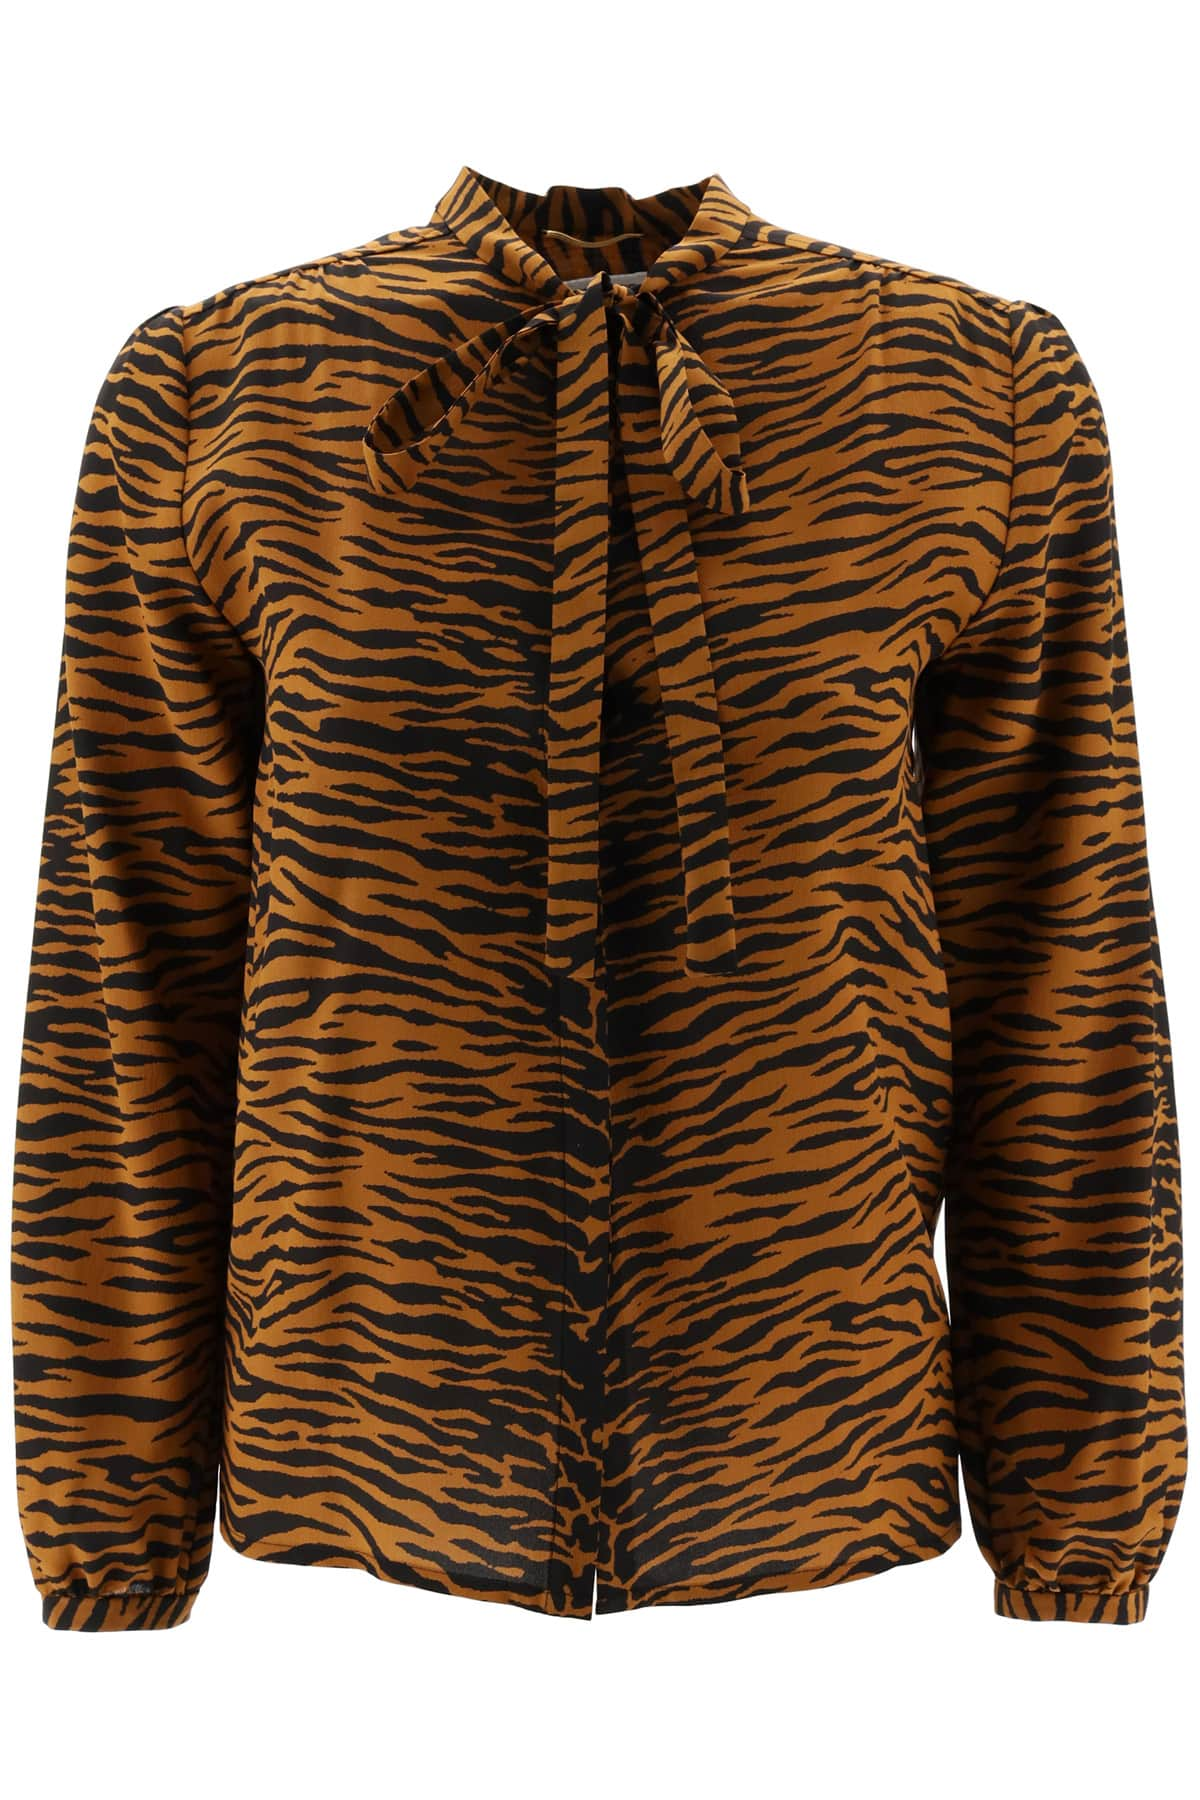 SAINT LAURENT TIGER PRINT SHIRT 36 Brown, Black Silk